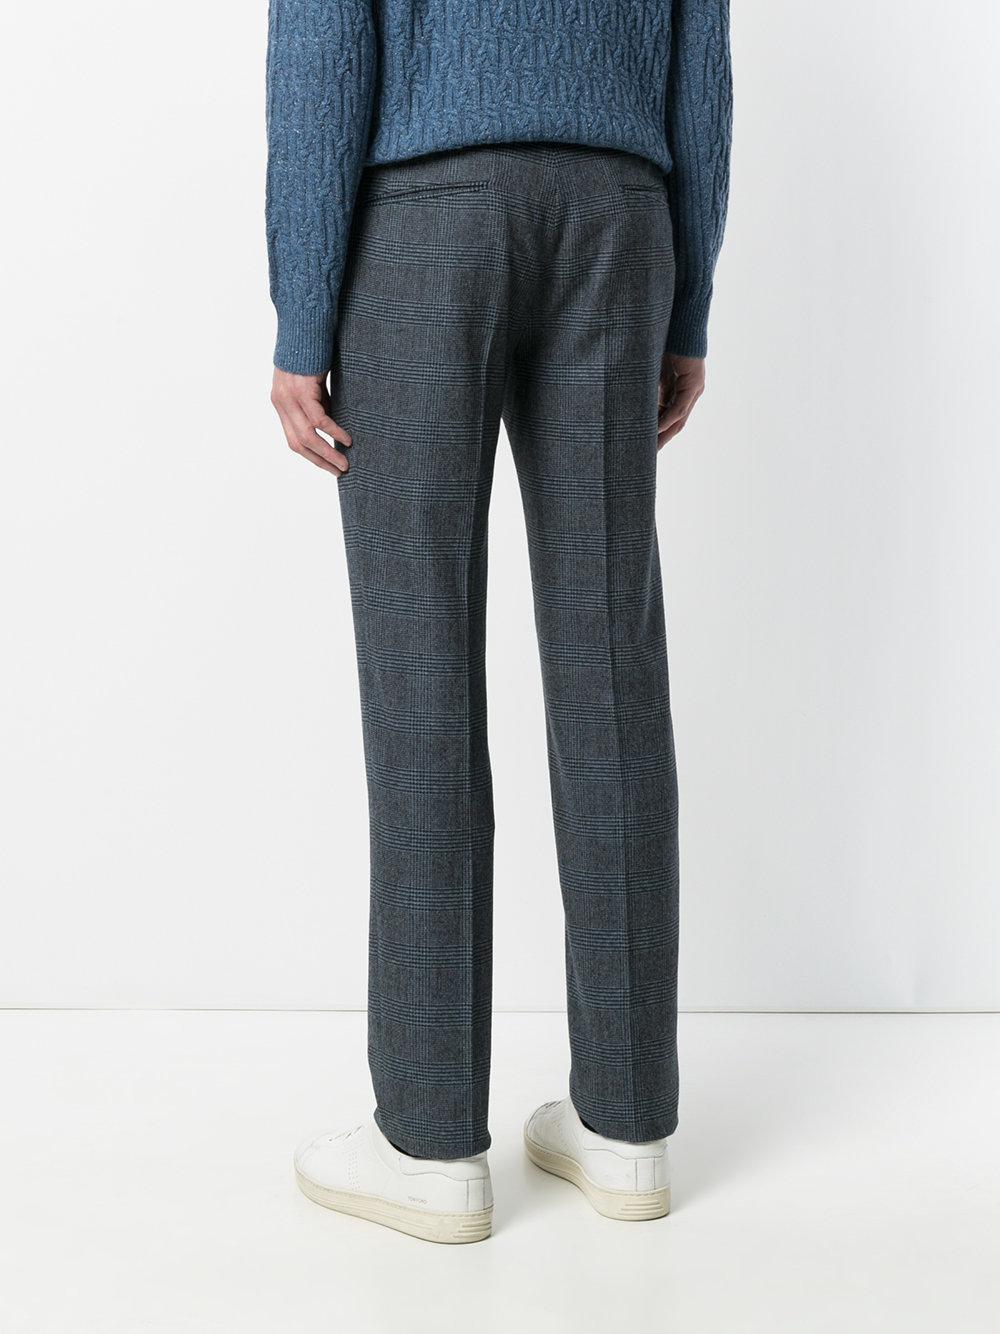 pantalones Plaid Blue hombres para Incotex Print Lyst wnZOqnxC